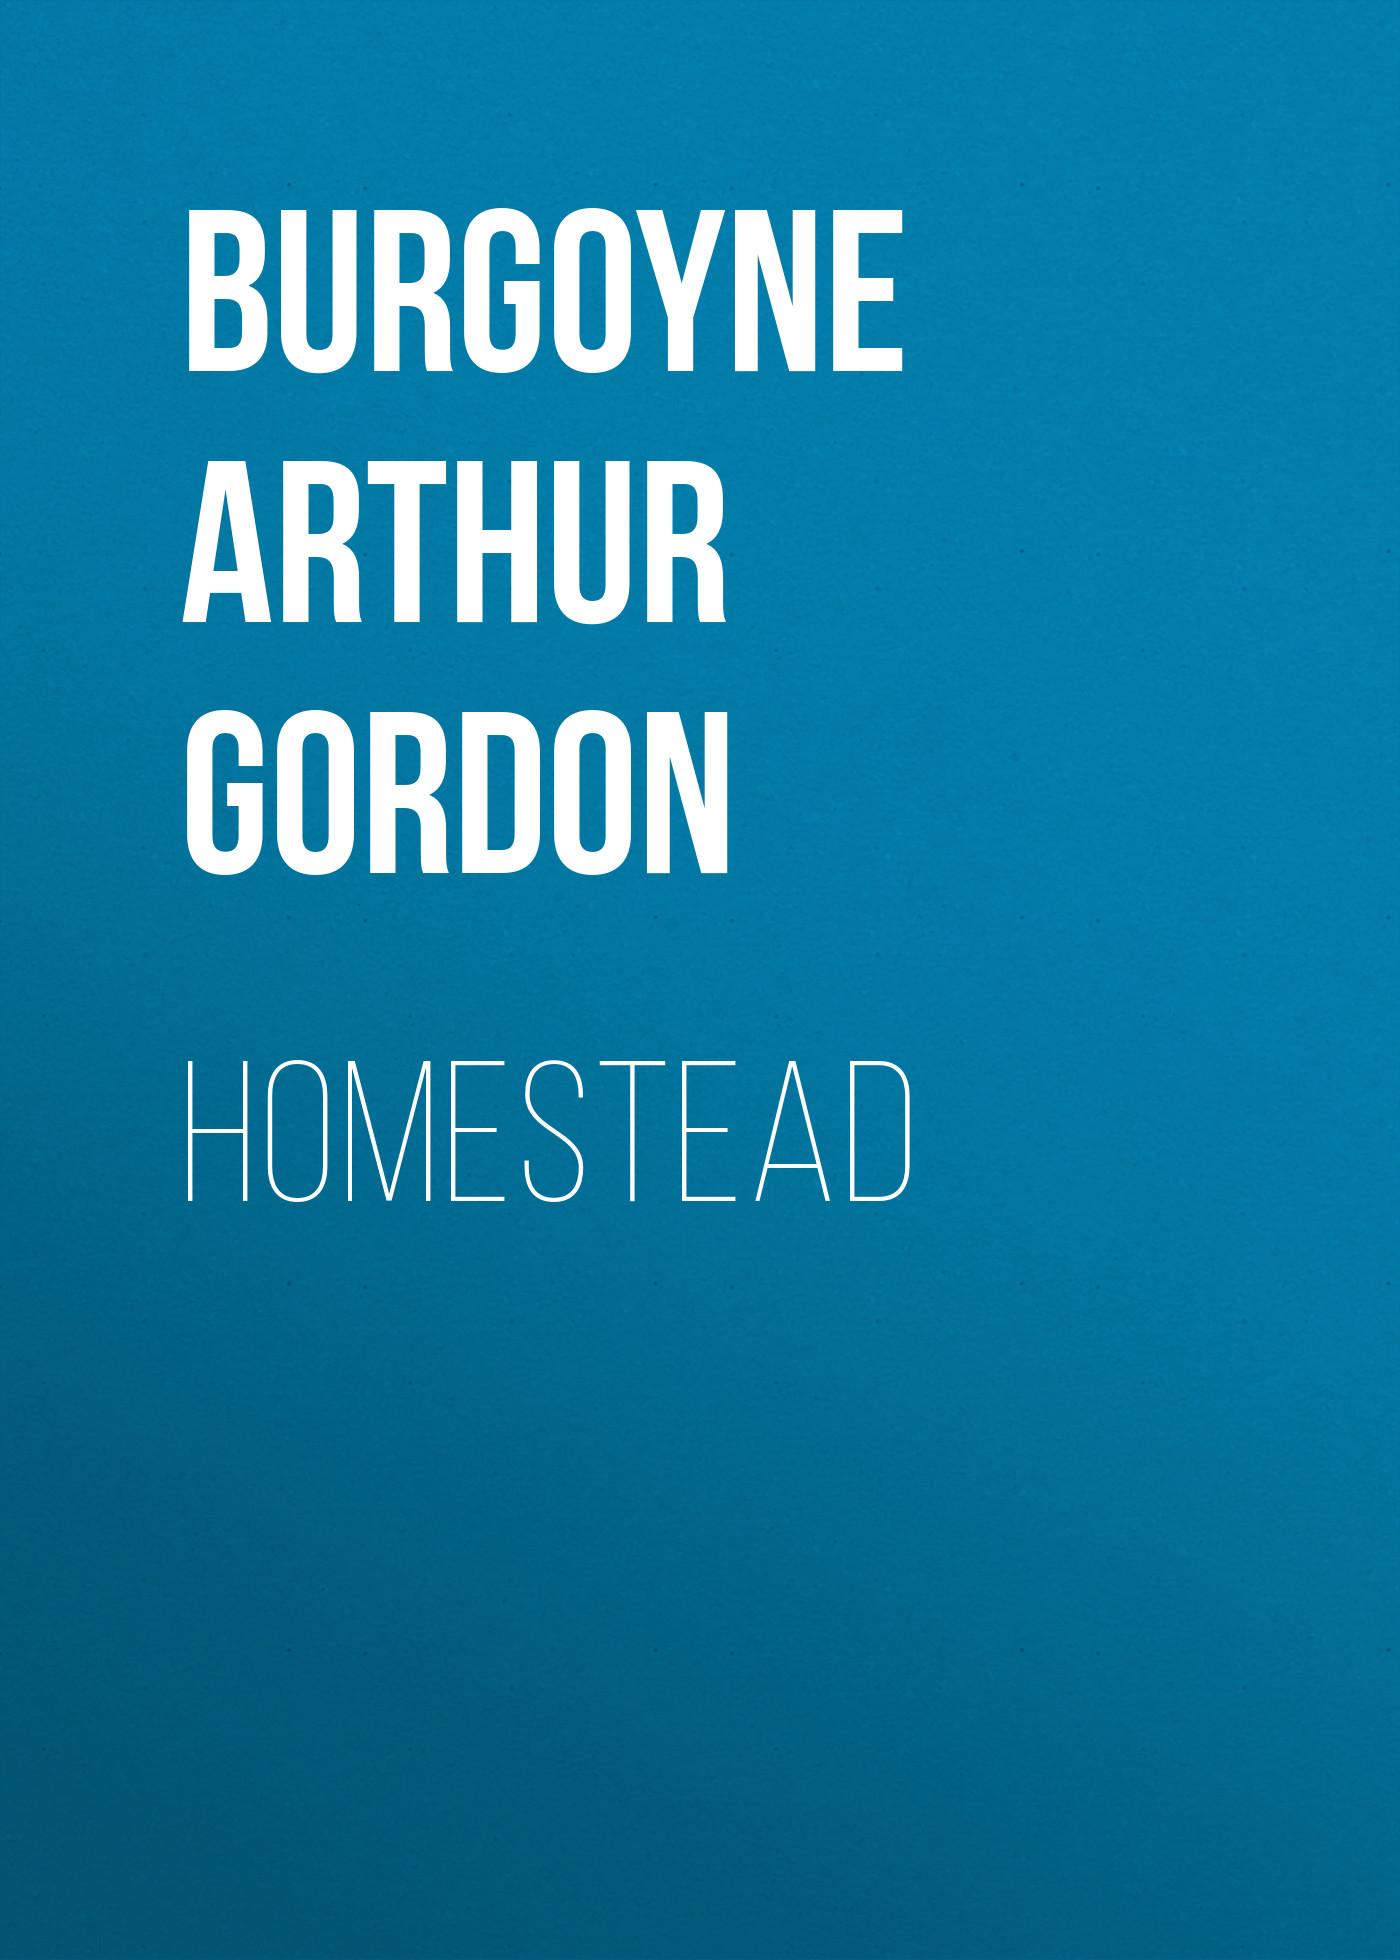 Burgoyne Arthur Gordon Homestead